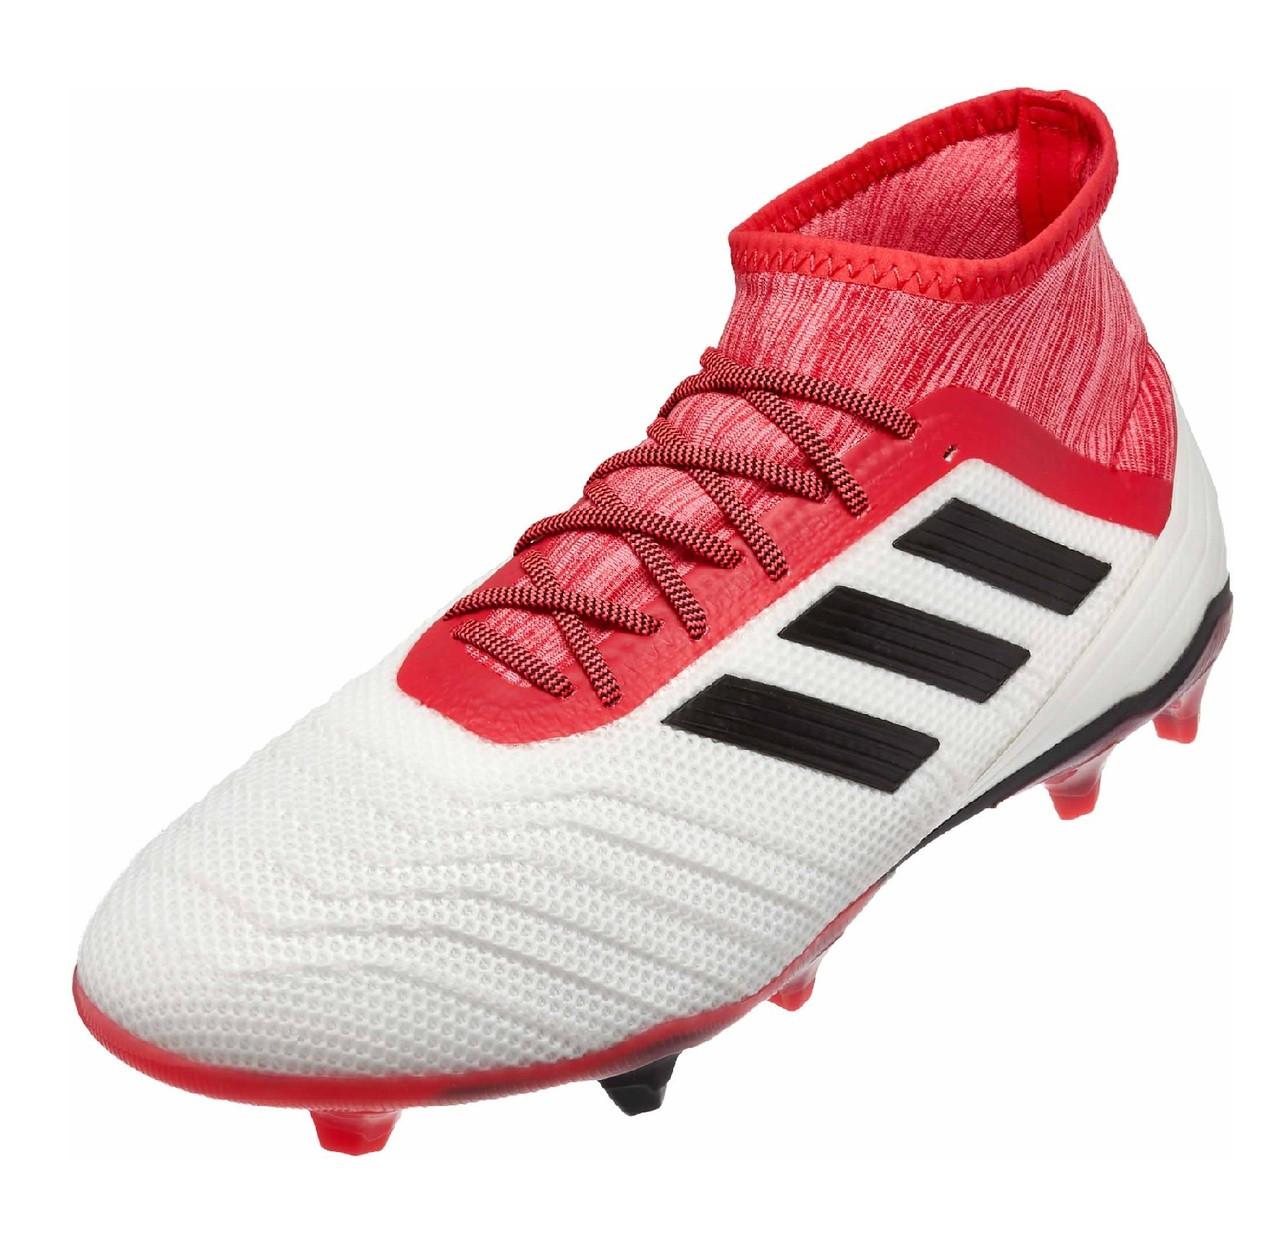 995433ccc84 Adidas Predator 18.2 FG - White/Core Black/Real Coral RC (06819)